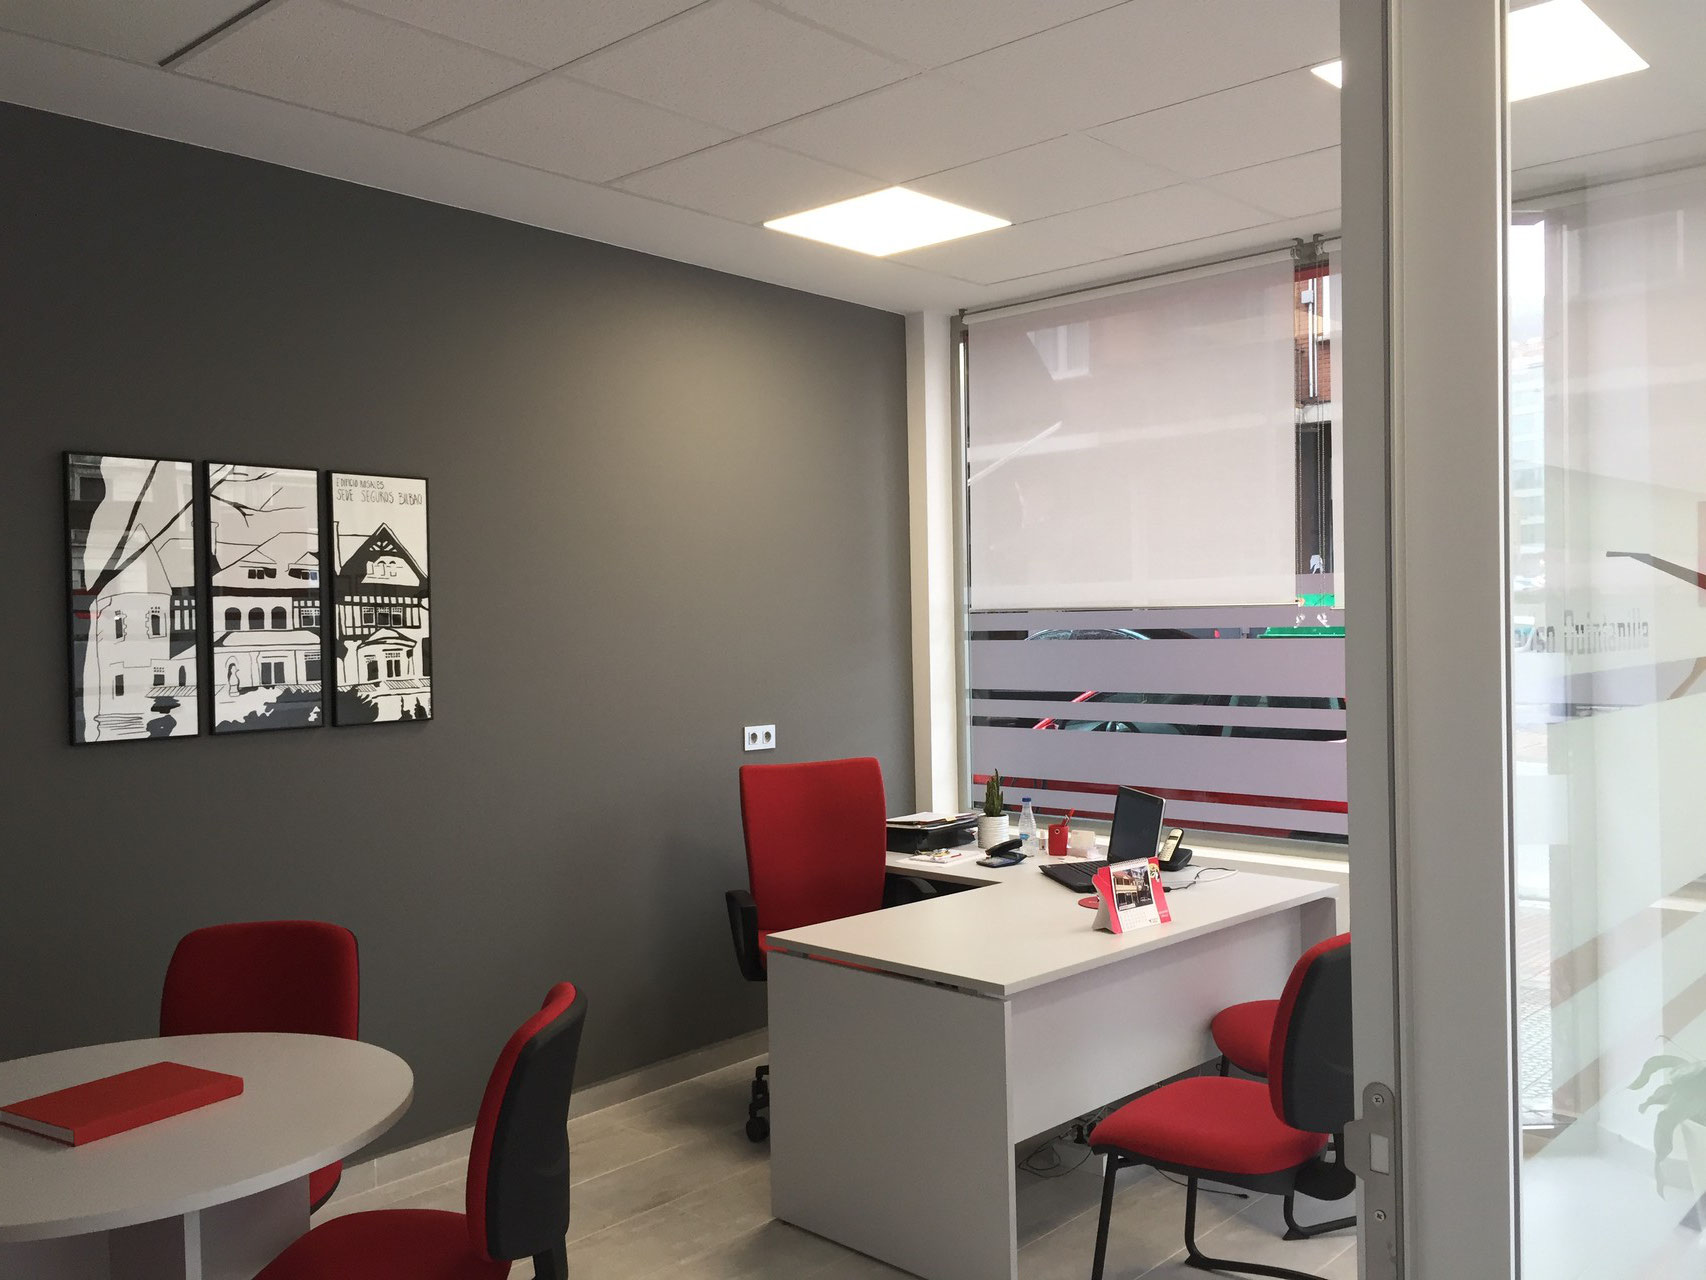 Oficina seguros bilbao estudio arkobi arquitectura interiorismo reformas bizkaia - Estudios arquitectura bilbao ...